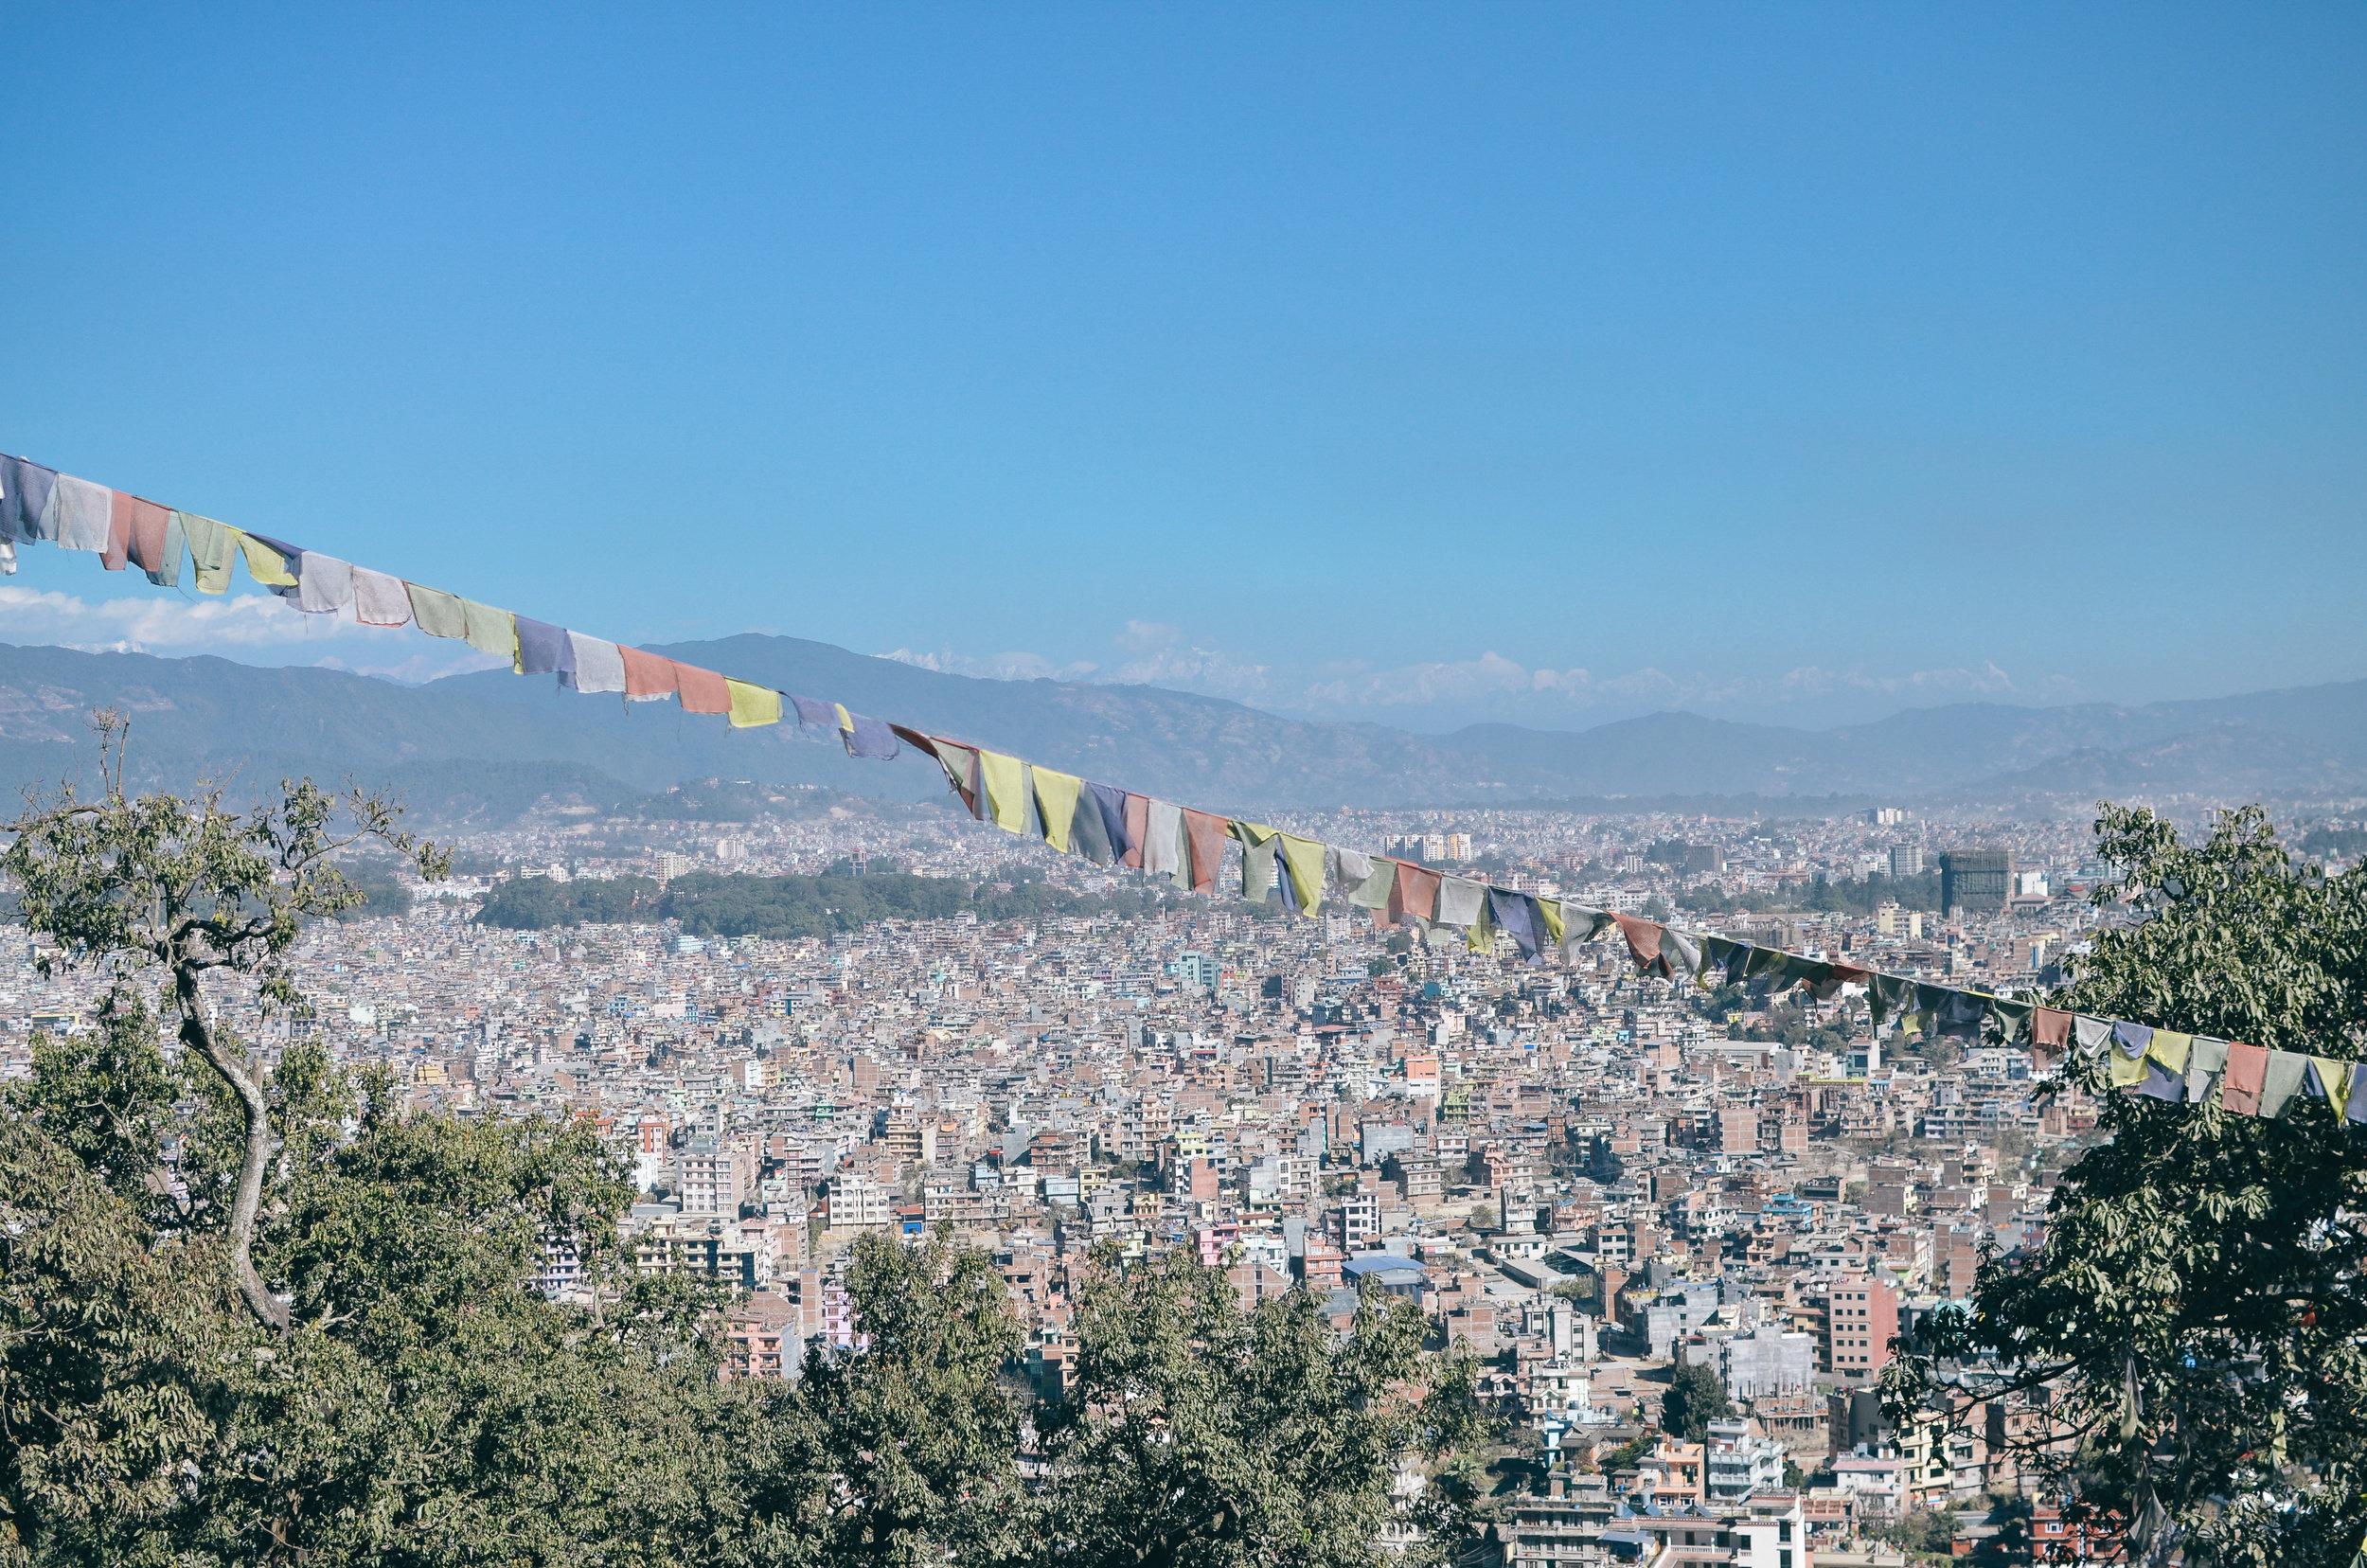 10-things-to-know-kathmandu-nepal-lifeonpine_DSC_1720.jpg